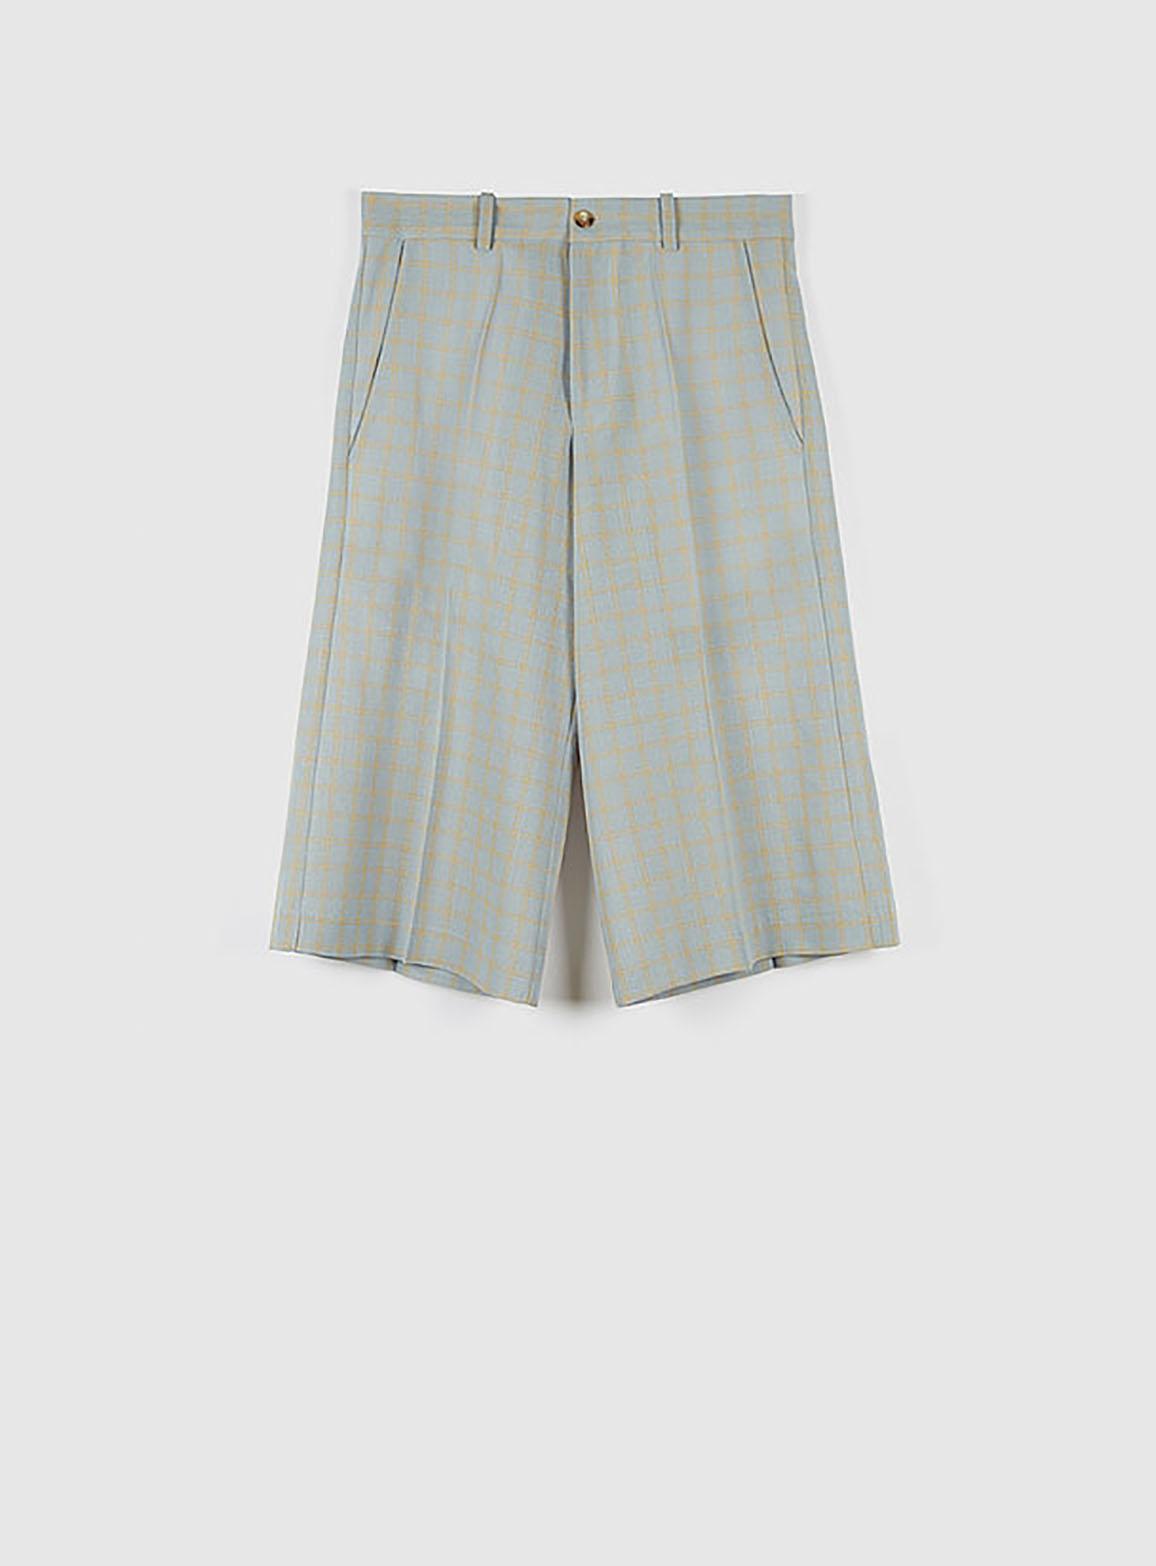 Bruce pants light blue/yellow checks